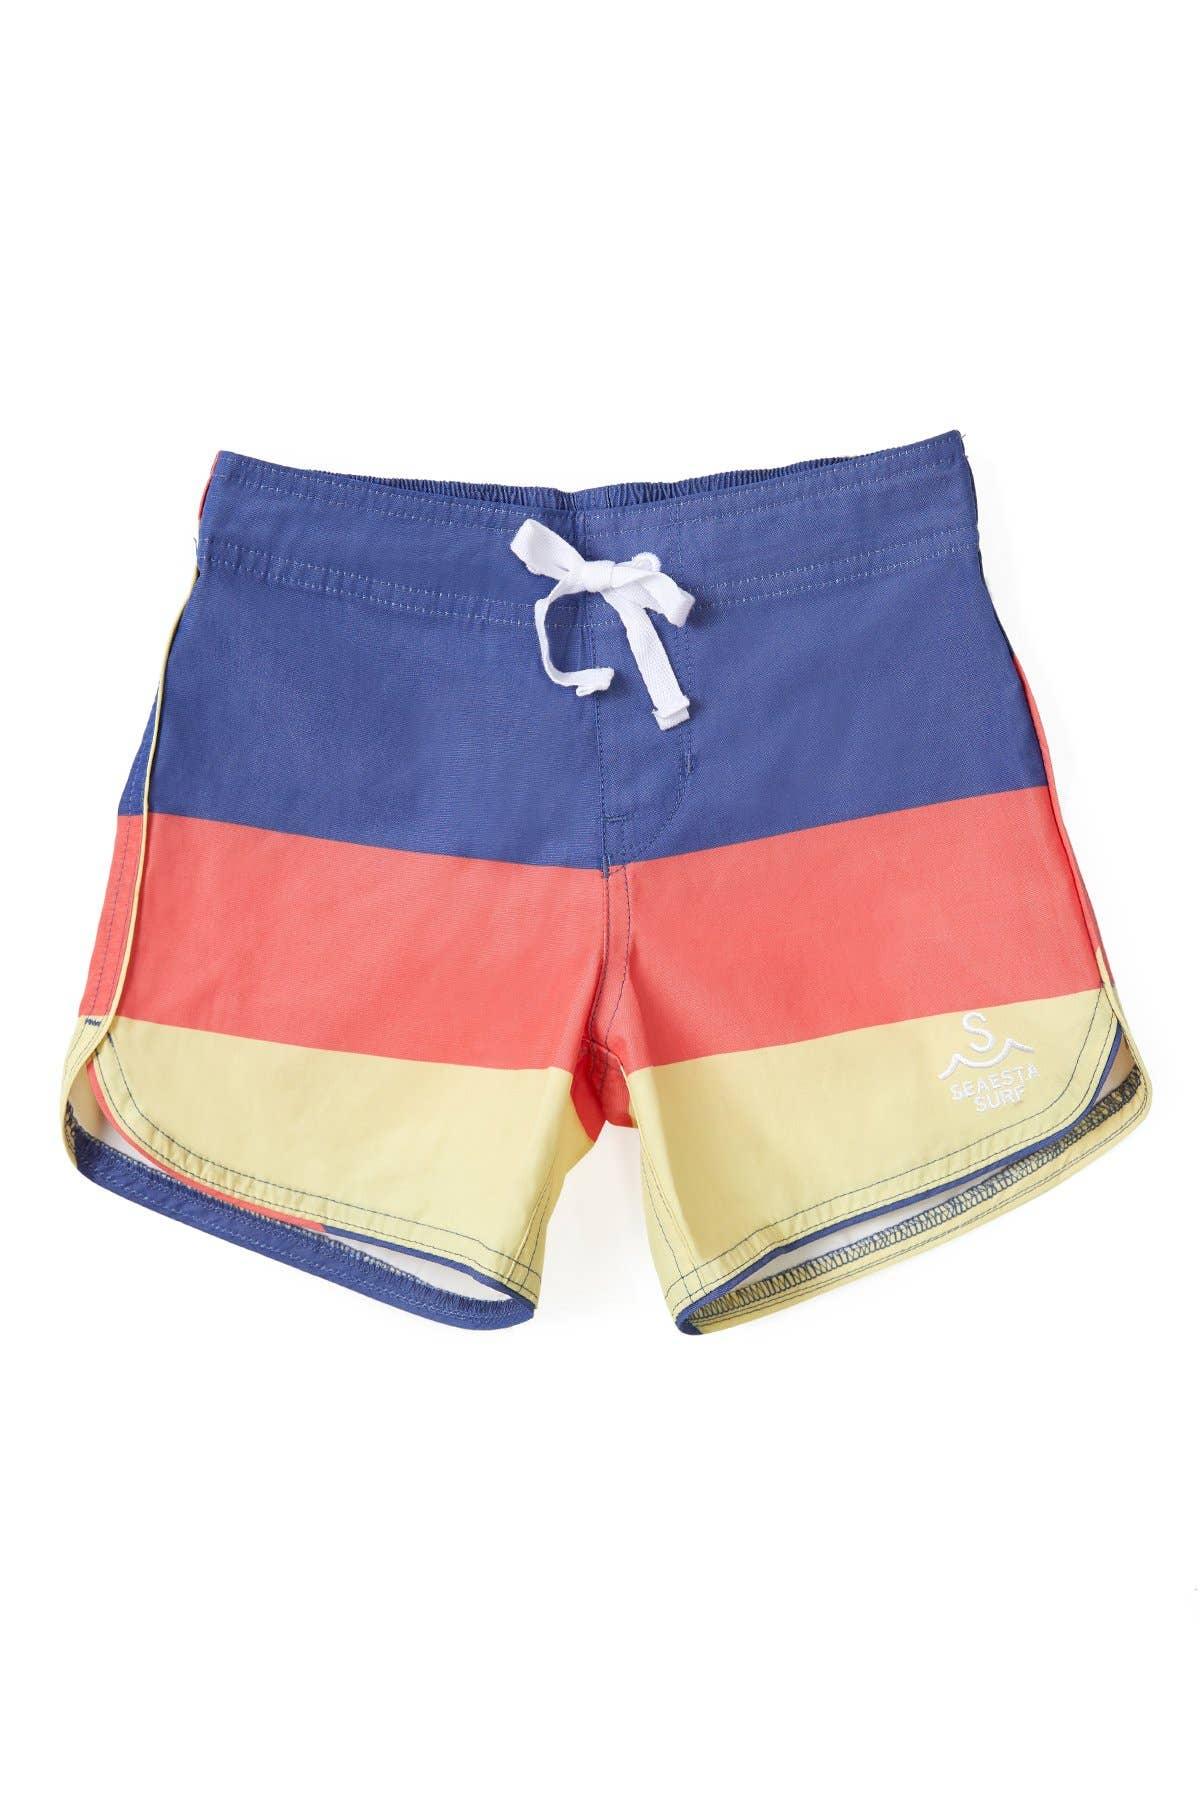 NestYu Mens Relaxed Fit Thin Printing Basic Vogue Beach Board Shorts